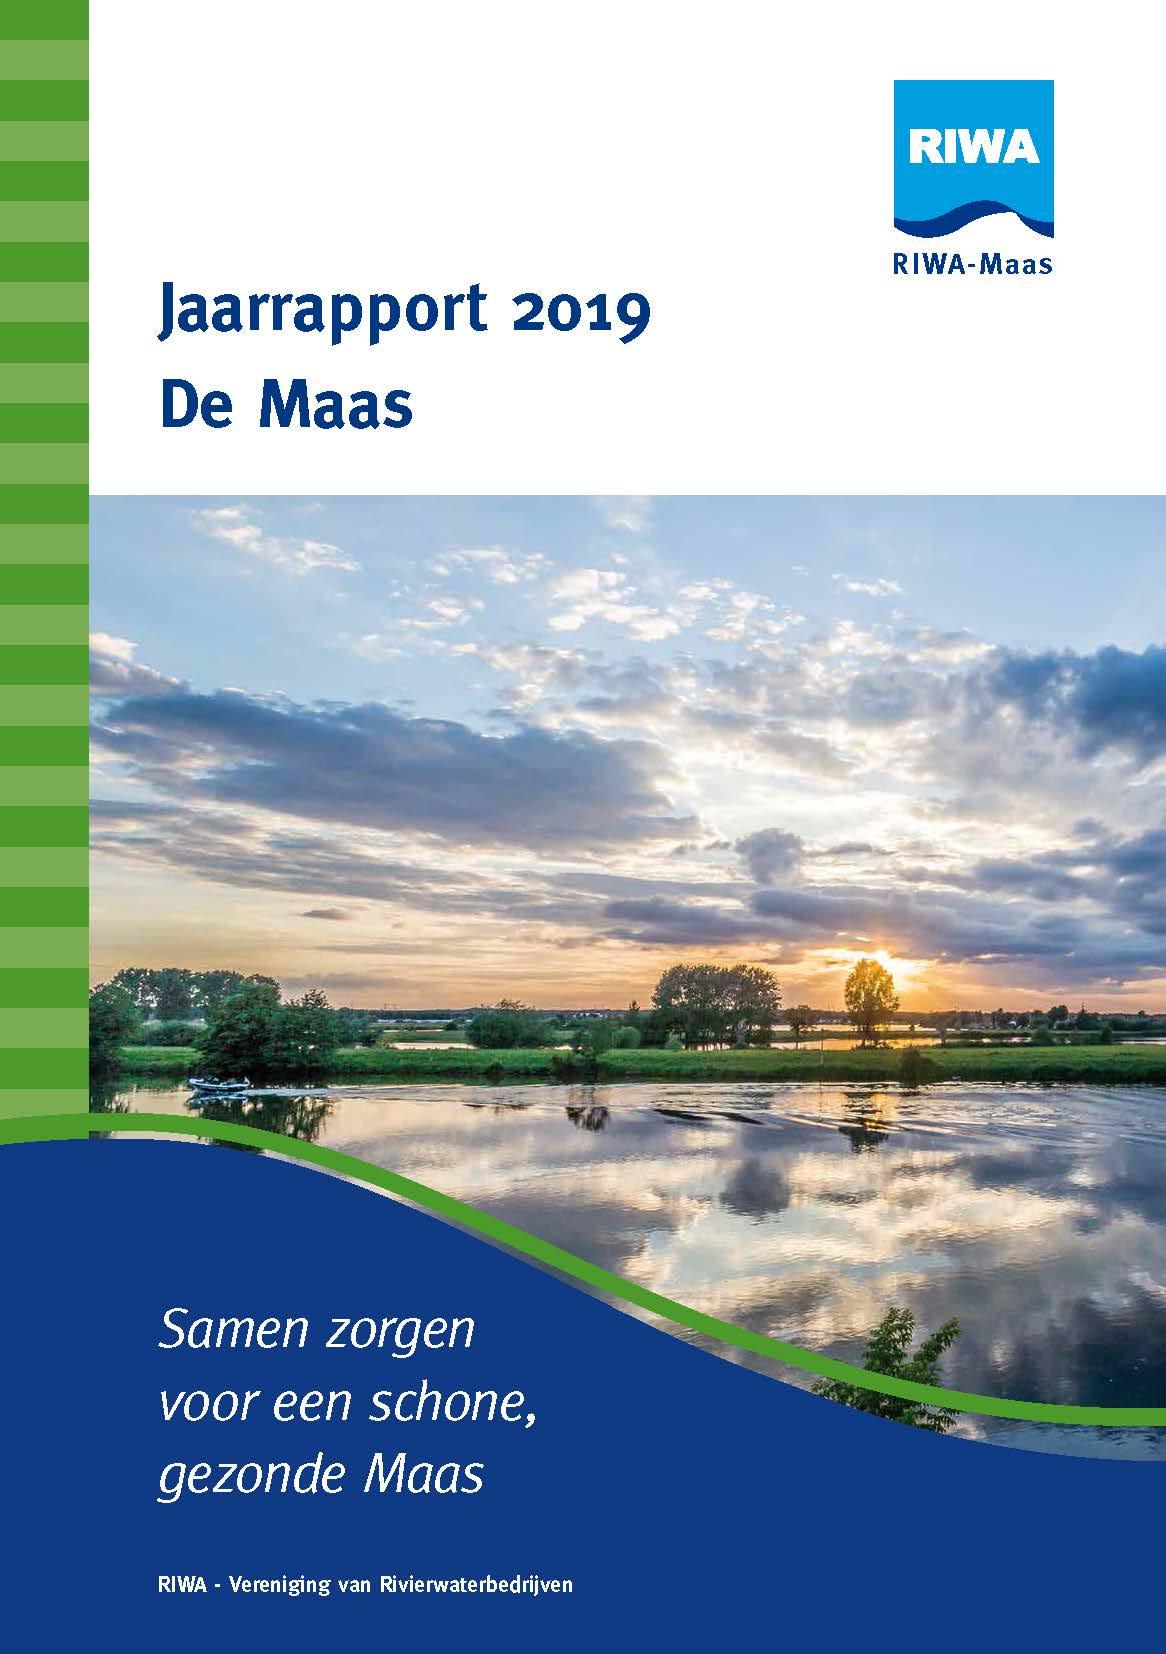 RIWA Jaarrapport 2019 De Maas